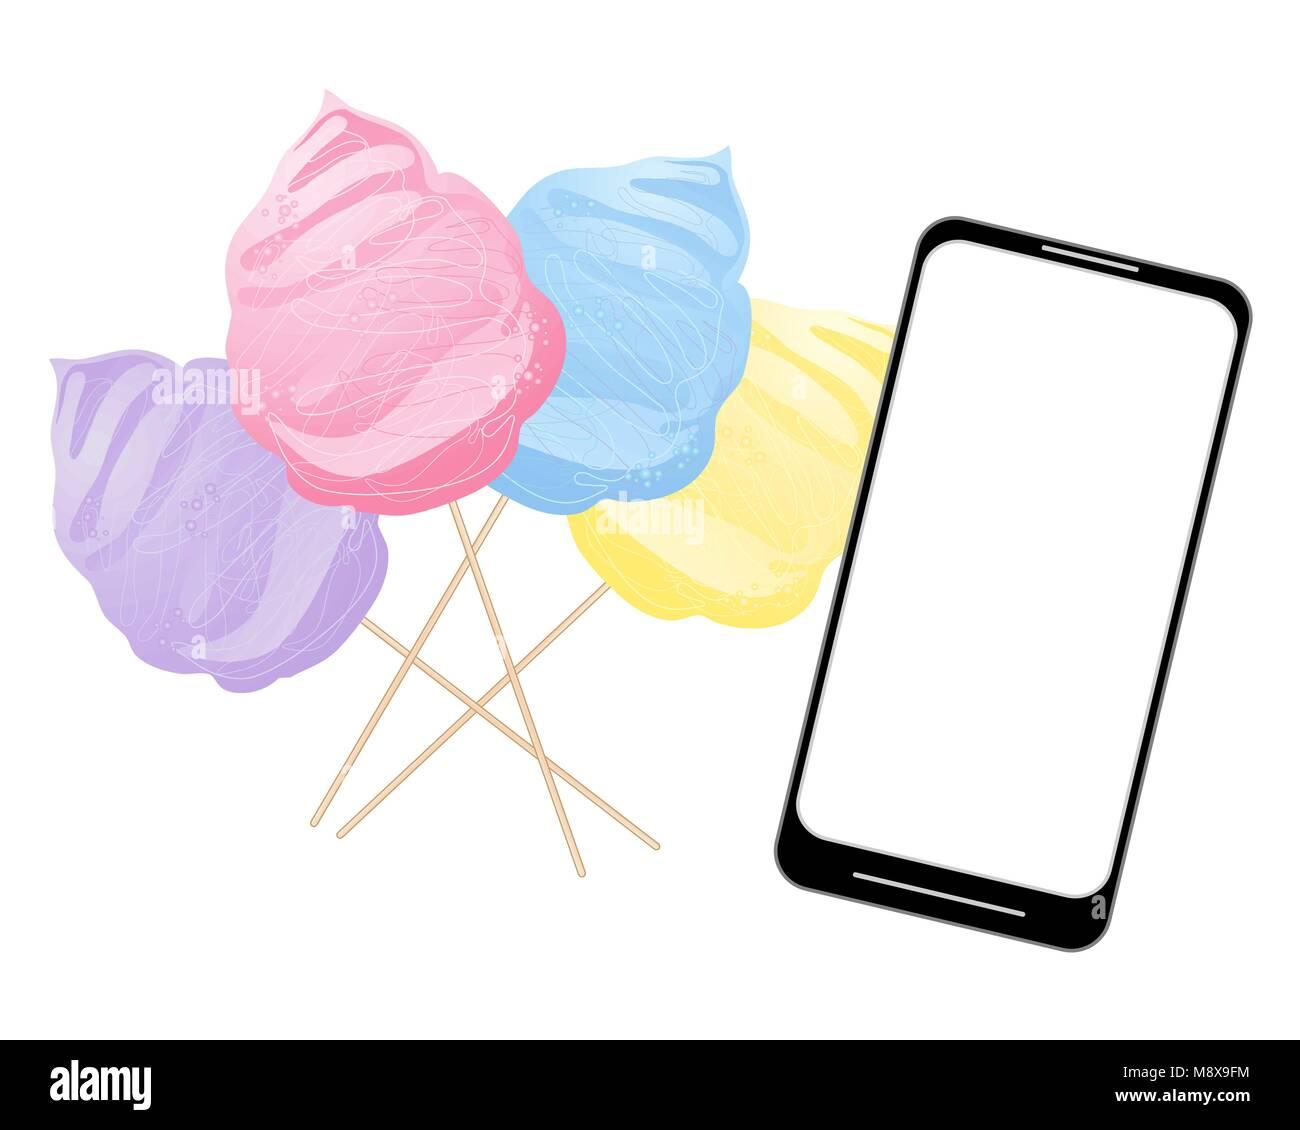 Cotton Candy Advert Stockfotos & Cotton Candy Advert Bilder - Alamy